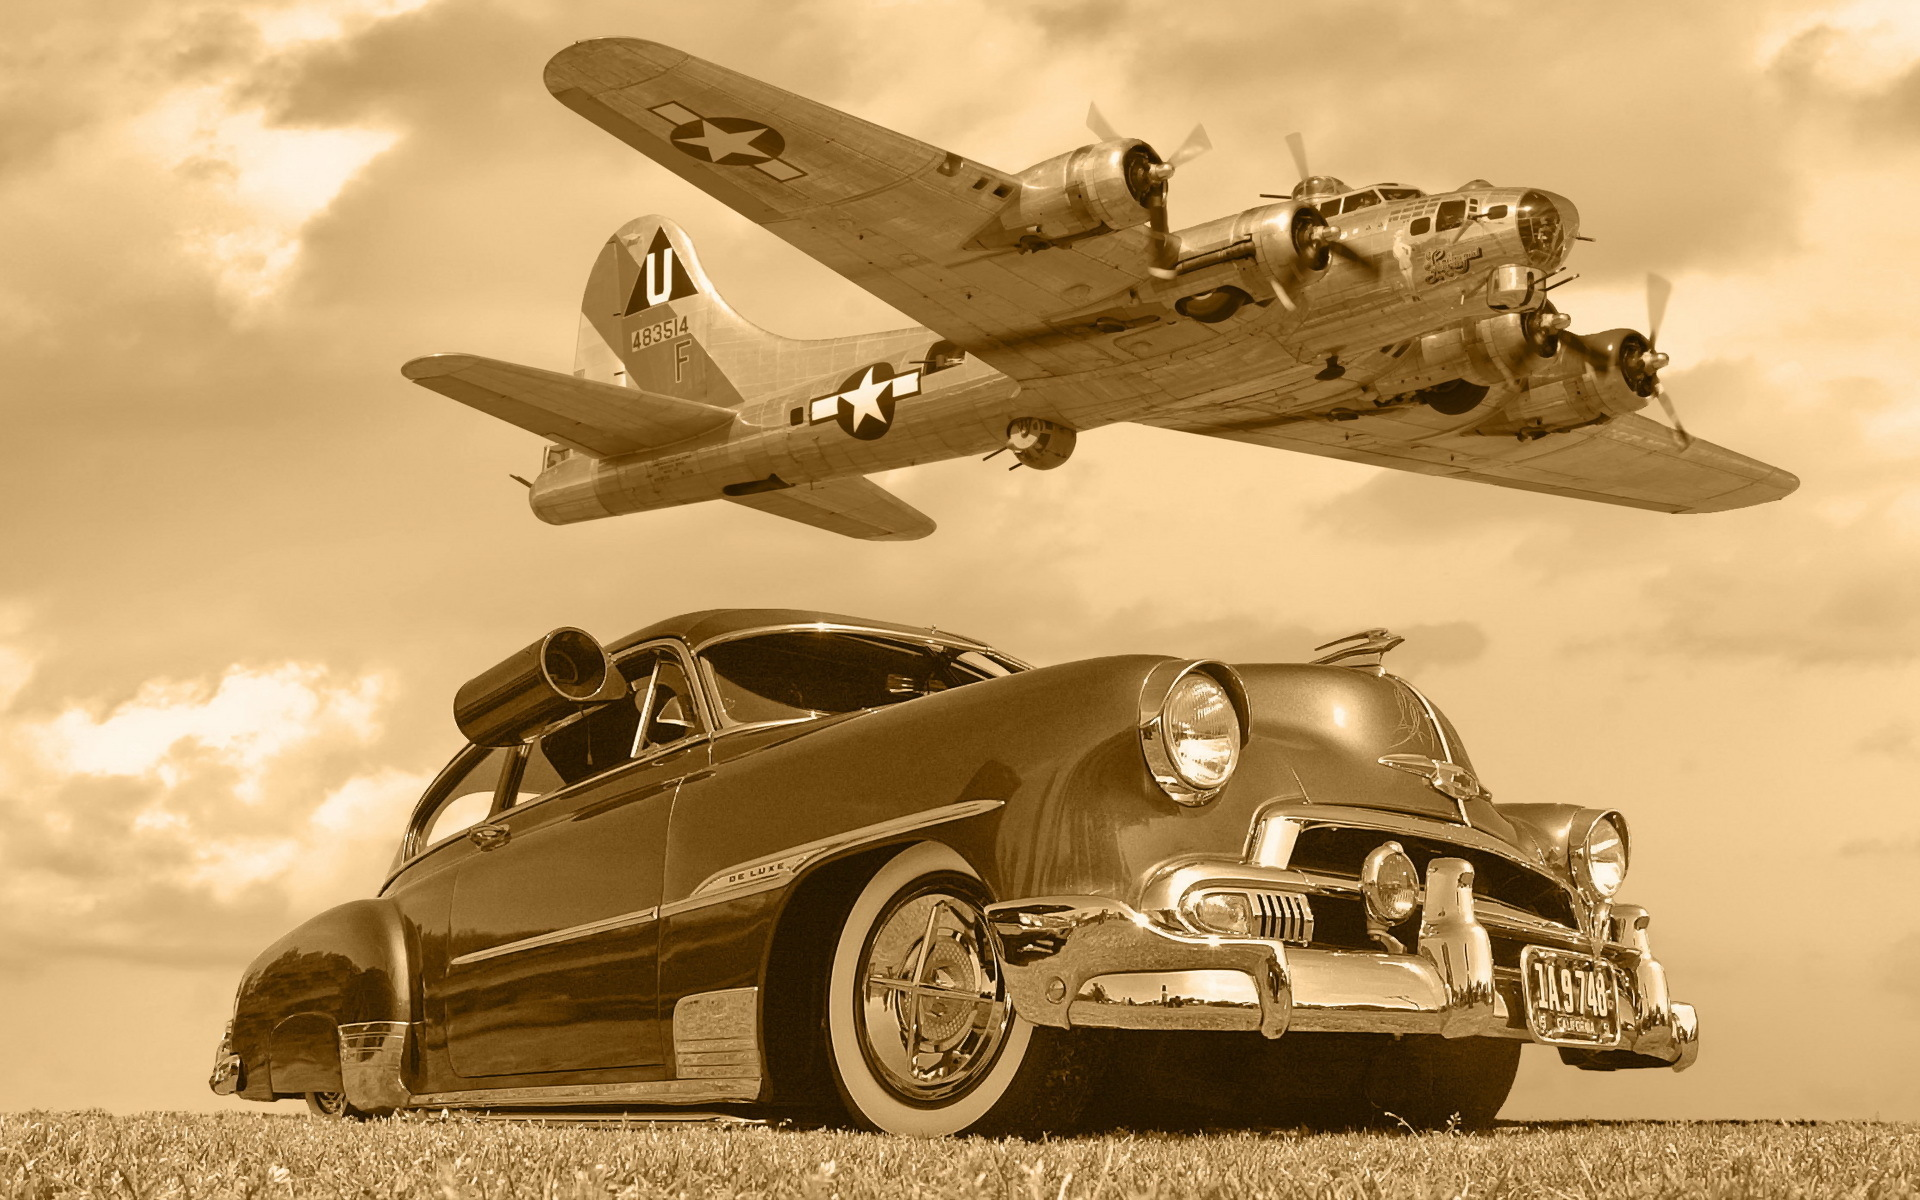 Chevrolet B17 Car Plane Aircrafts Lowrider Classic Military Flight